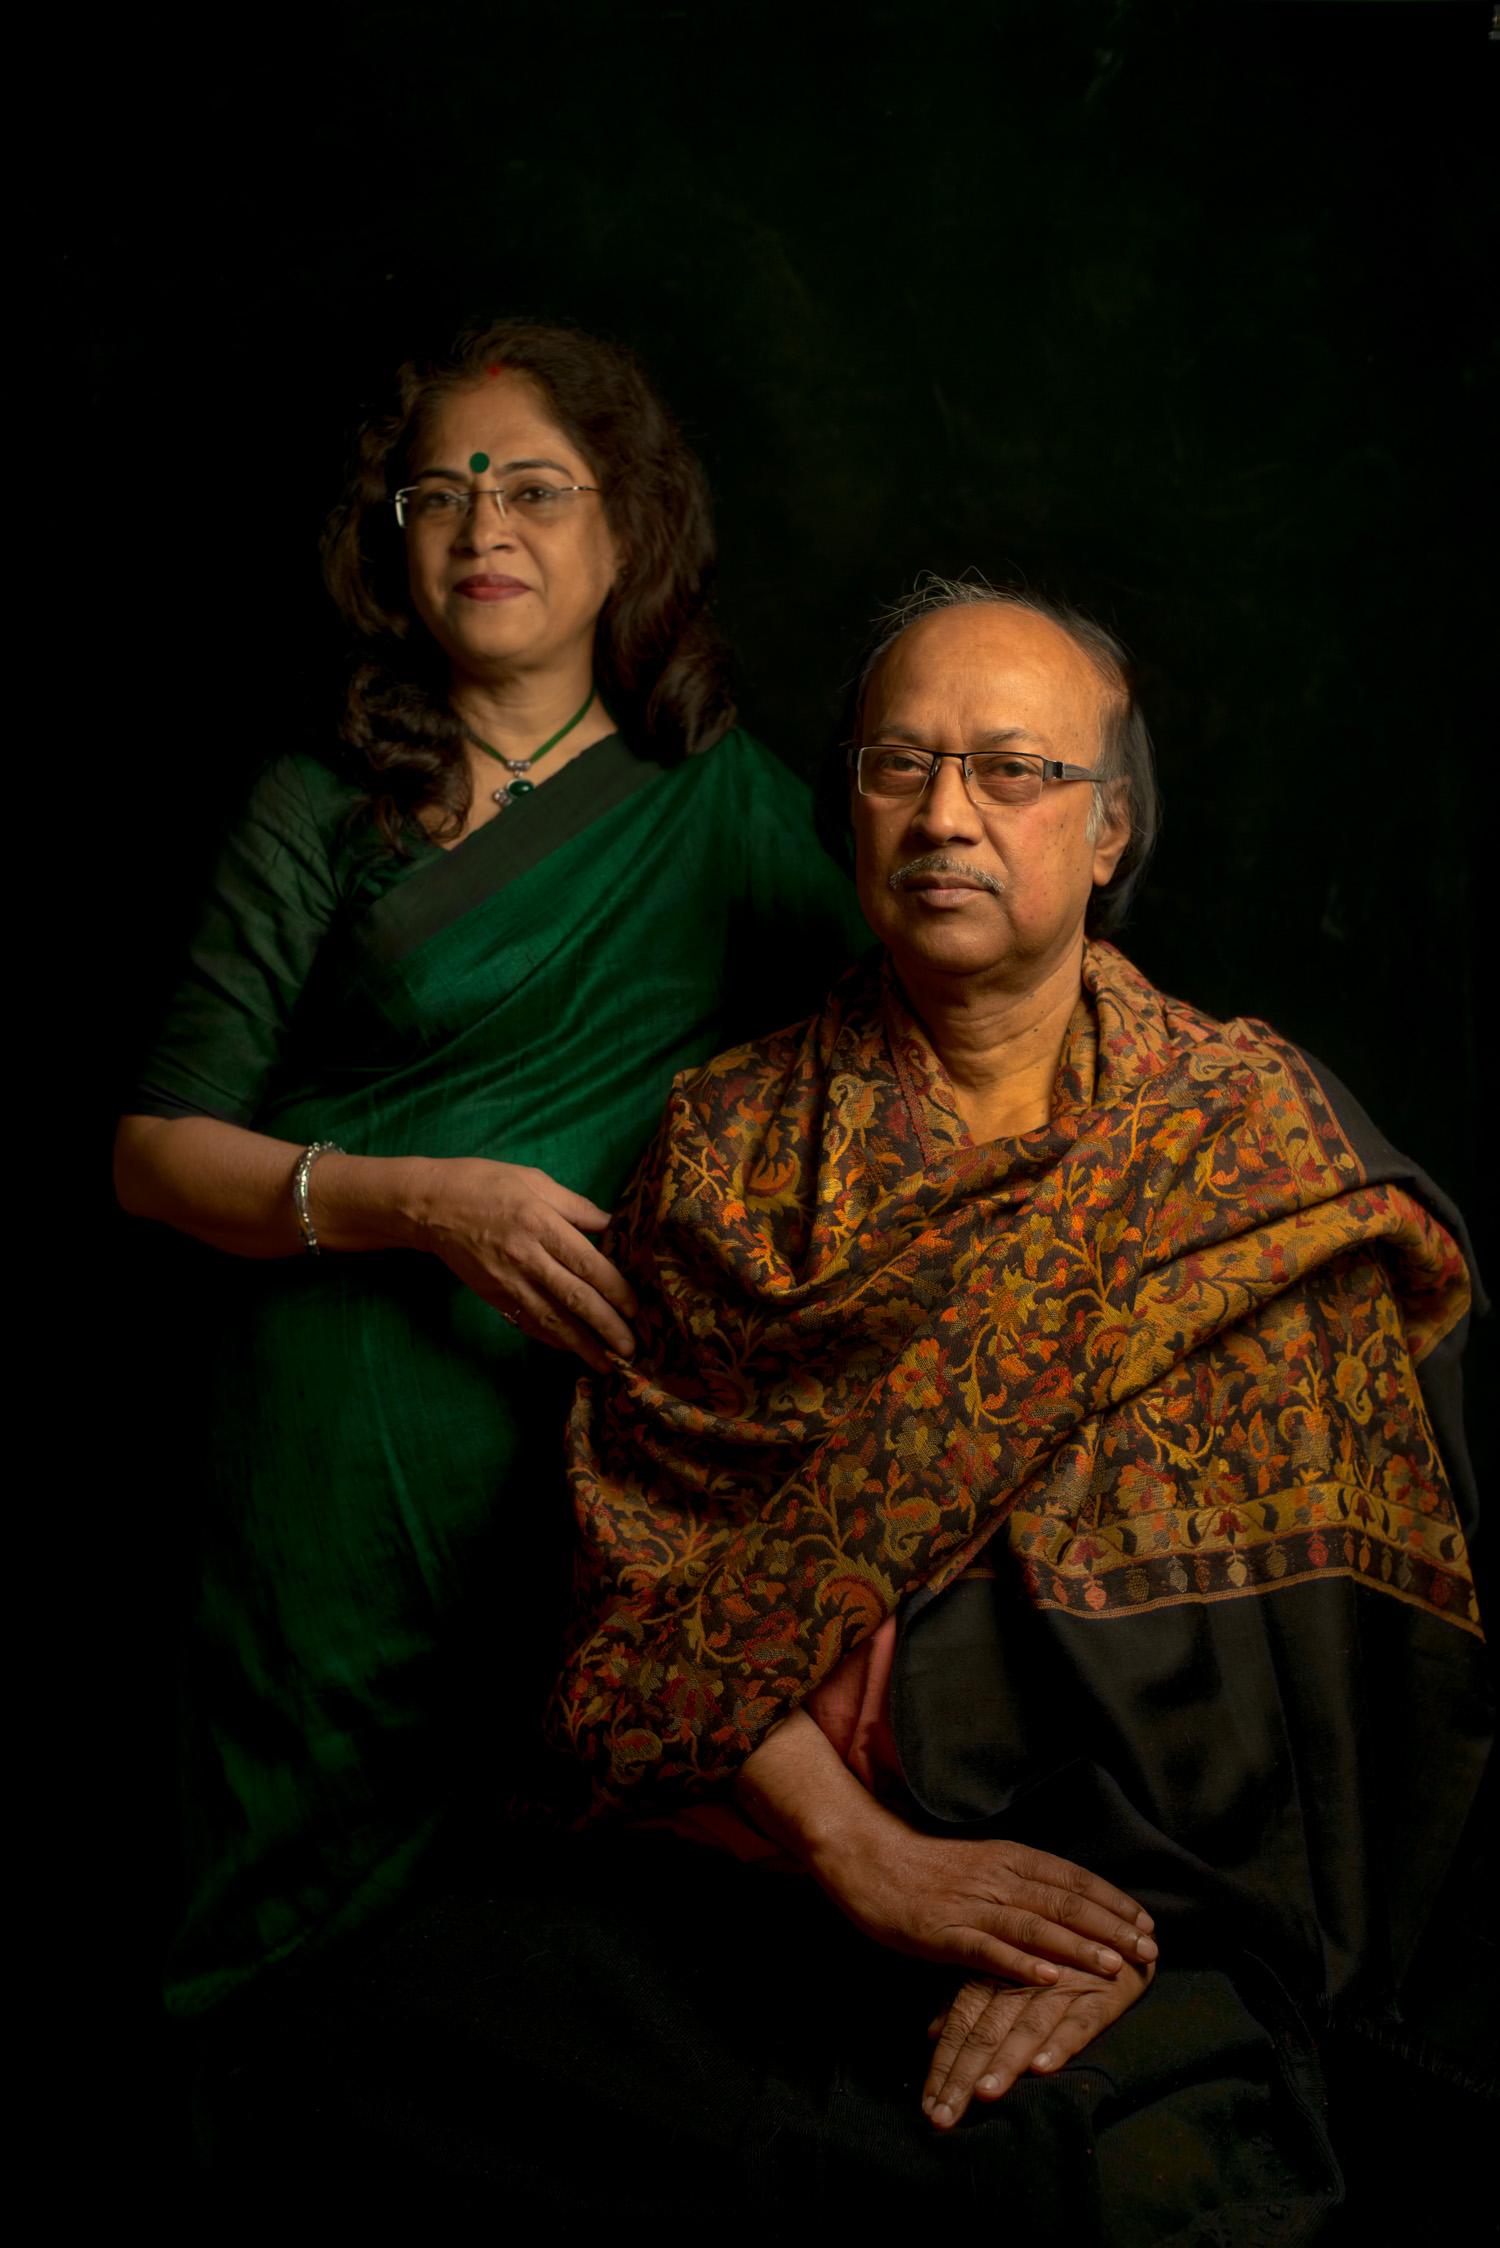 22_Chhandak Pradhan-portrait-singles-editorial.jpg